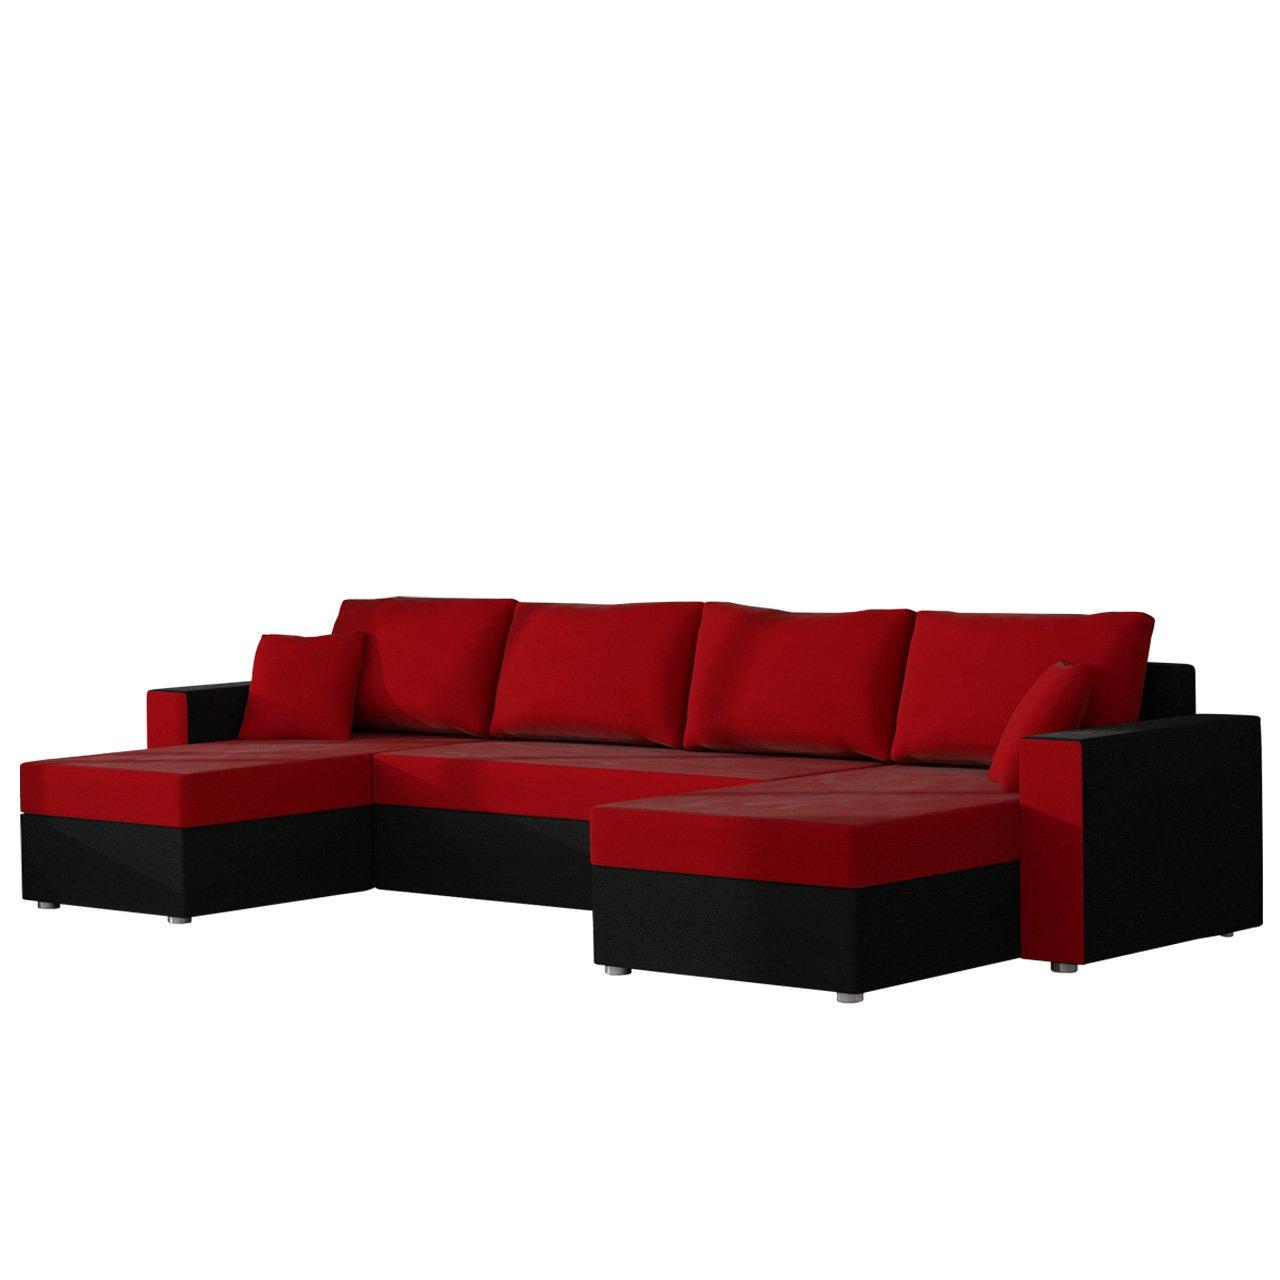 Mirjan24 Ecksofa Sofa Couchgarnitur Couch Rumba Style ...